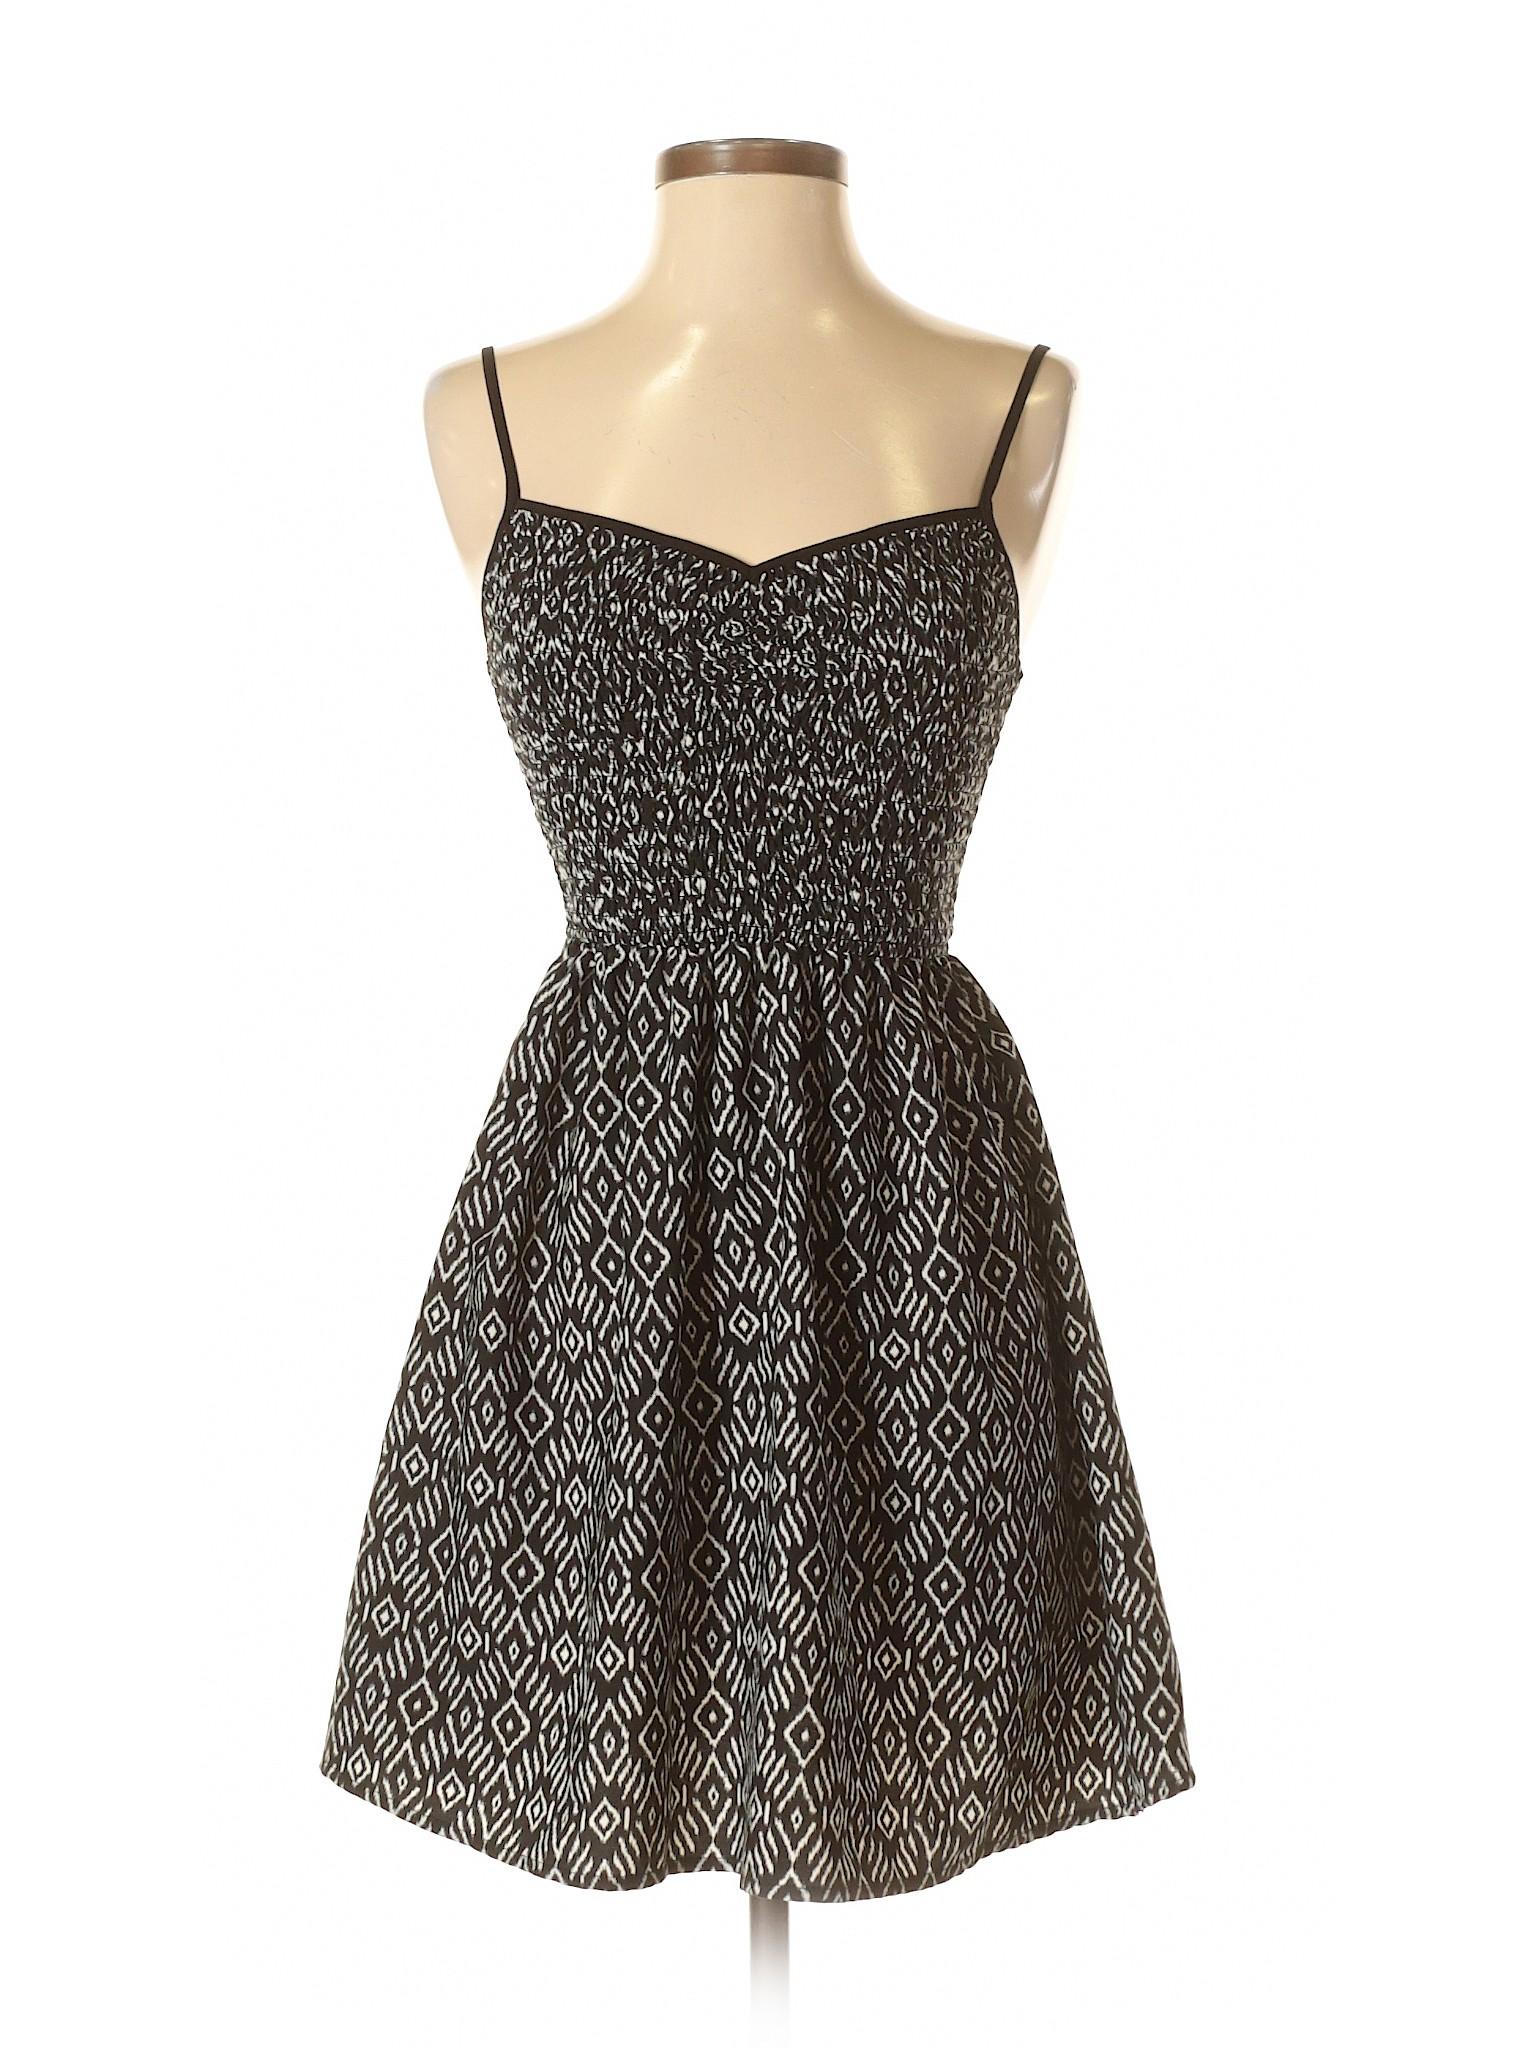 Boutique Dress Mackenzie winter Mason Casual AxqSAUz